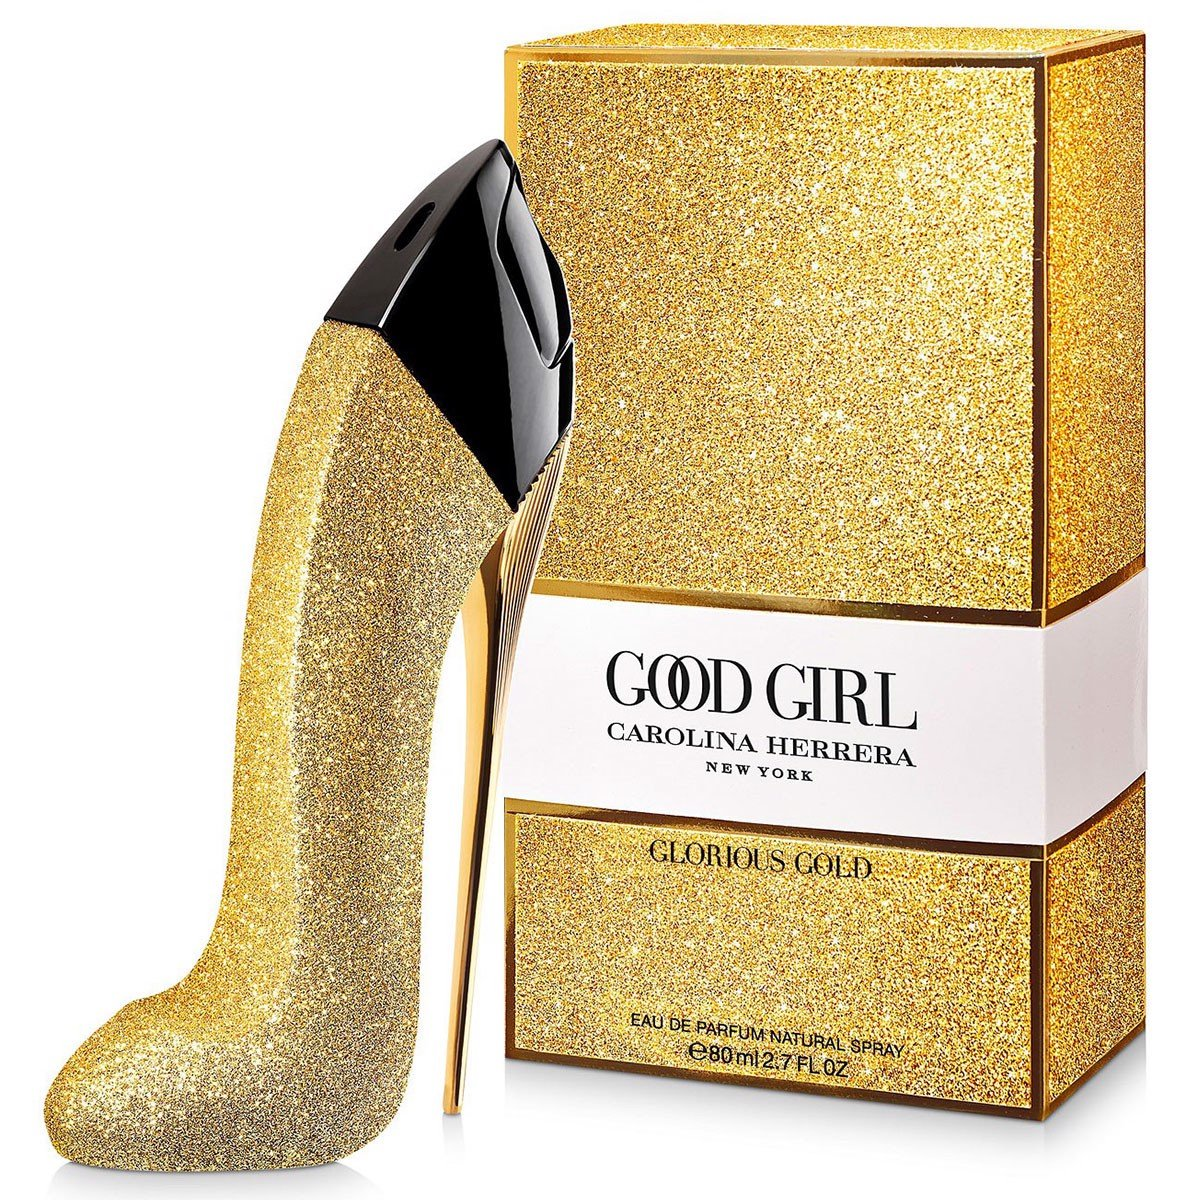 nuoc hoa carolina herrera good girl glorious gold edp